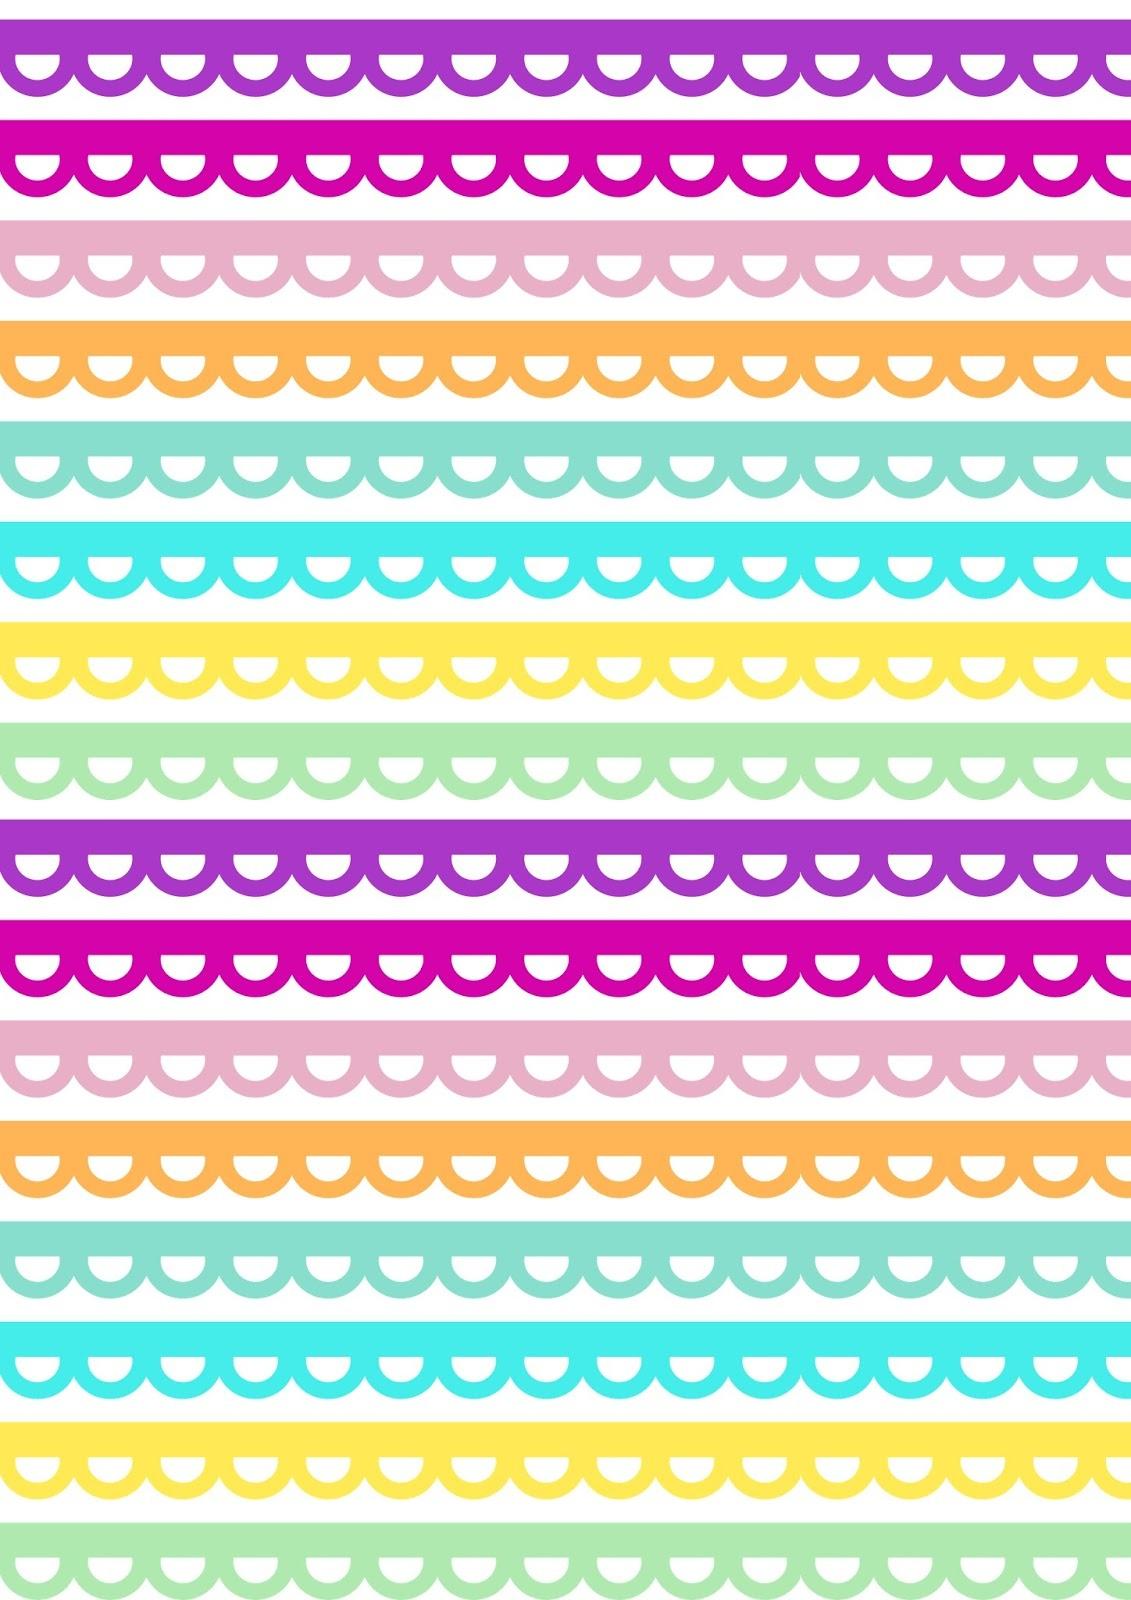 12 Best Photos Of Free Printable Scrapbook Borders - Free Digital - Free Printable Borders For Scrapbooking